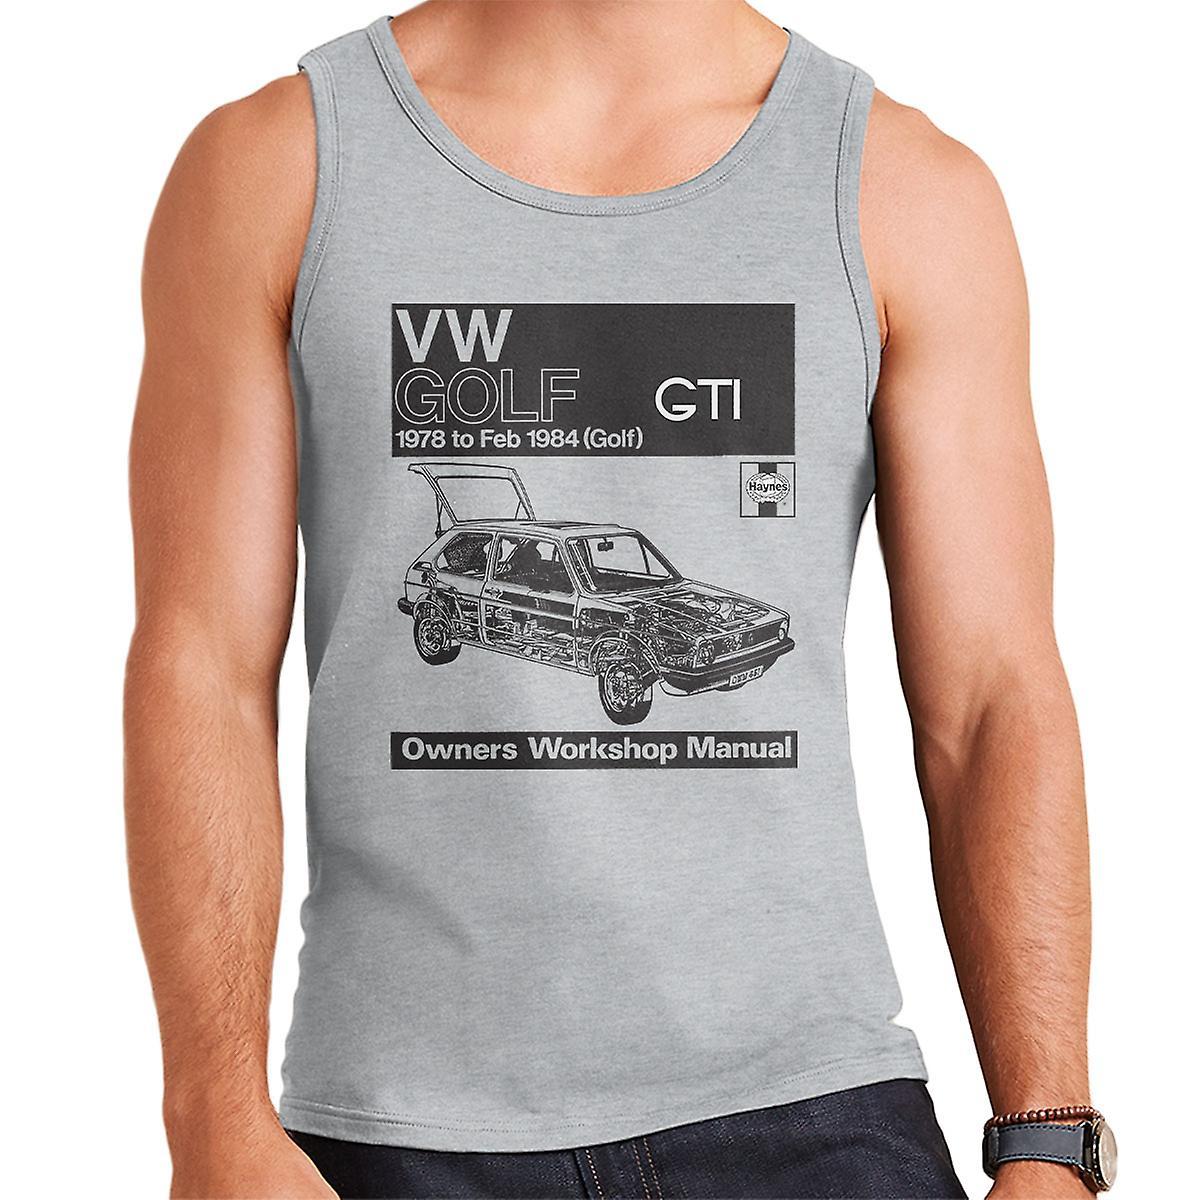 Haynes Workshop manuell VW Golf GTI 78 til 84 svart menn Vest